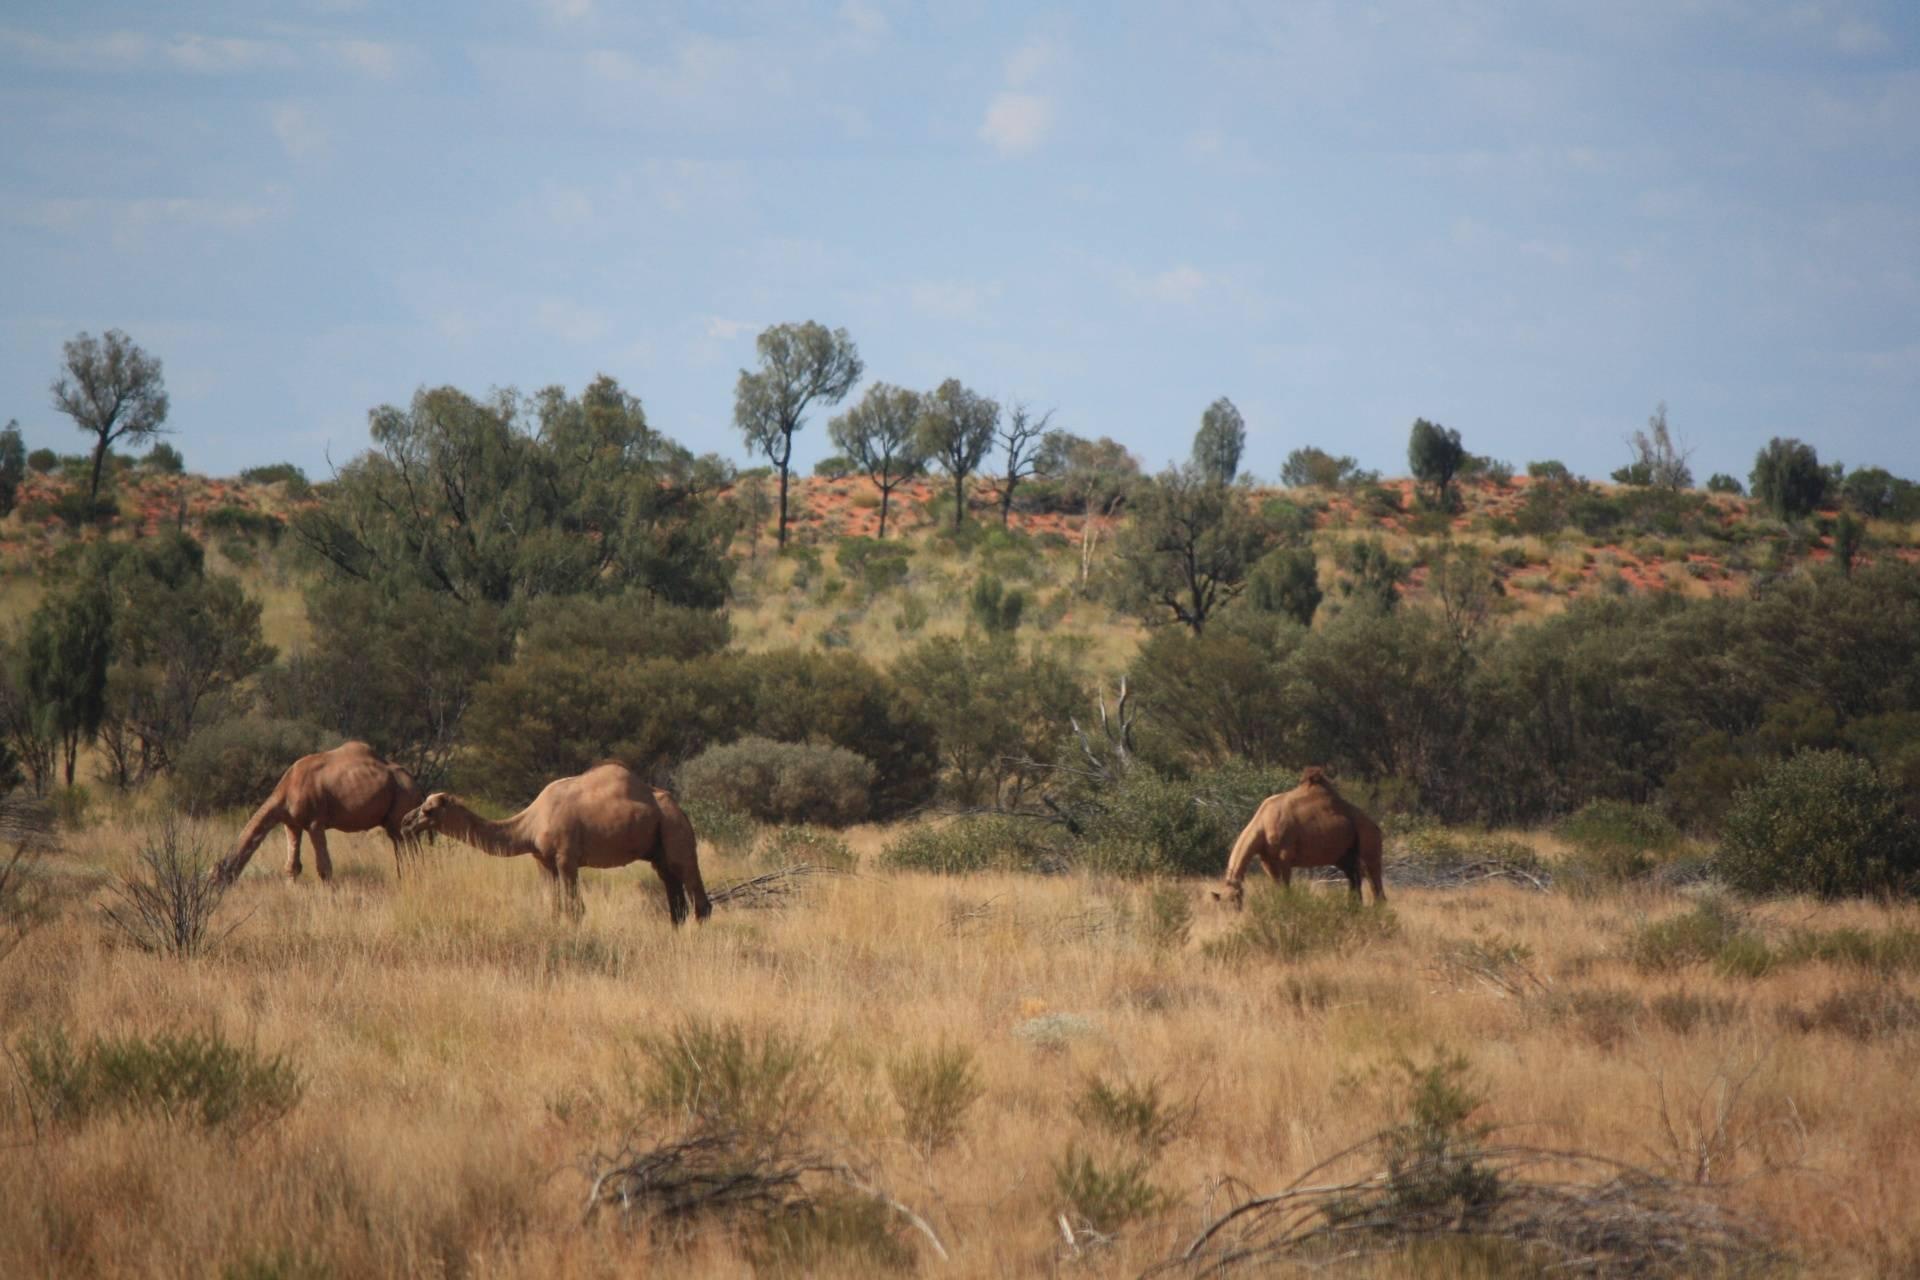 Wild camels near Ayers Rock (Uluru)